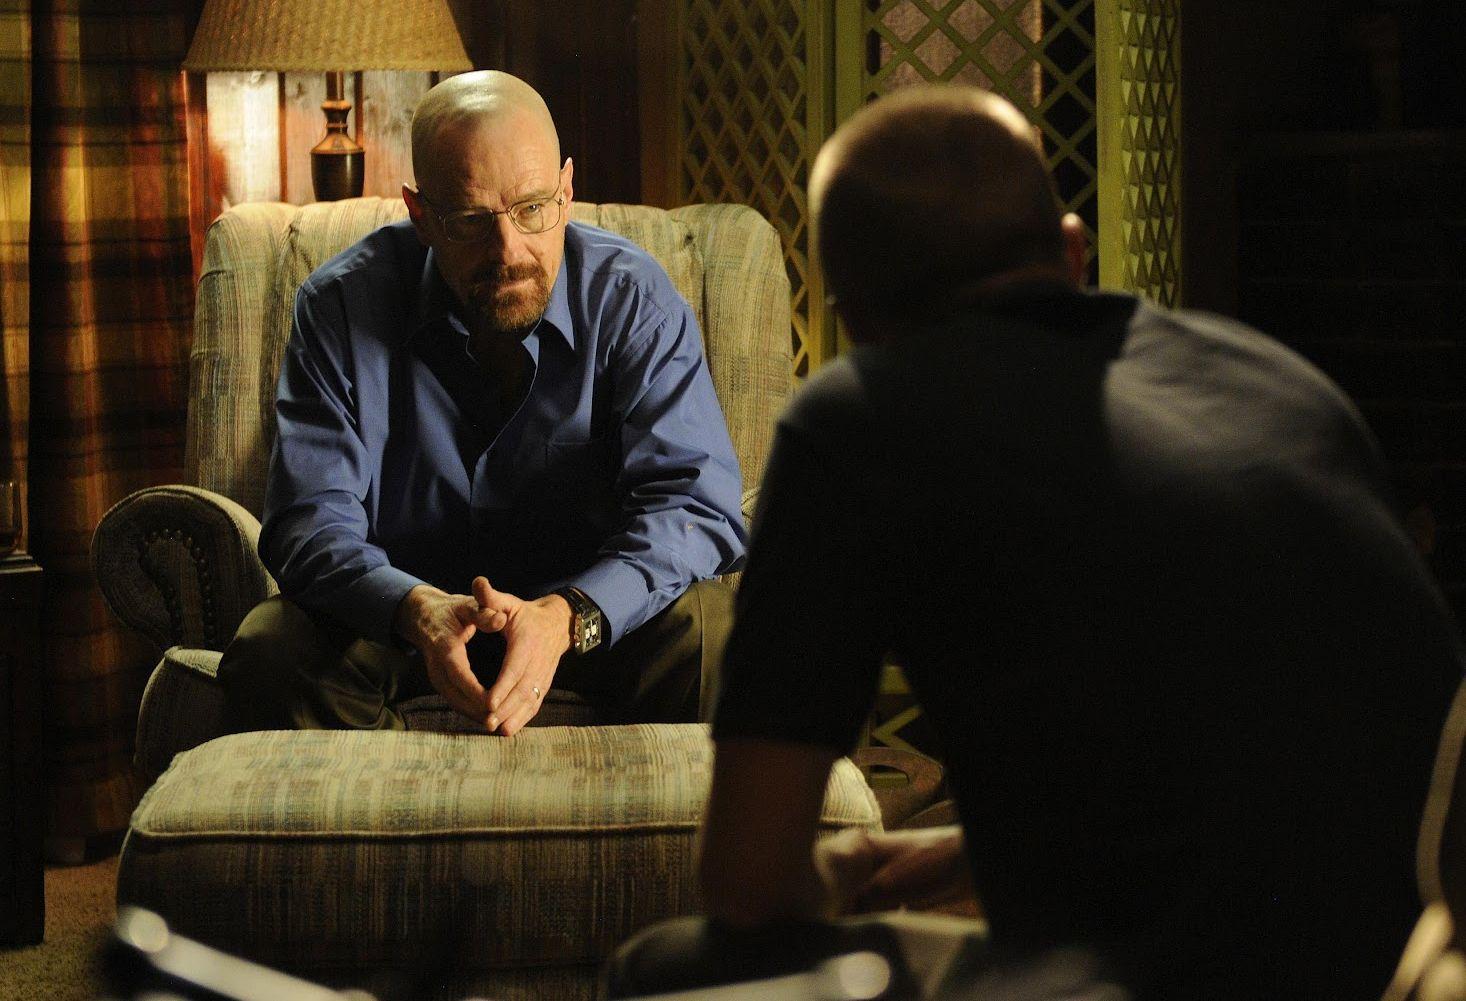 Walter White manipulating Jesse